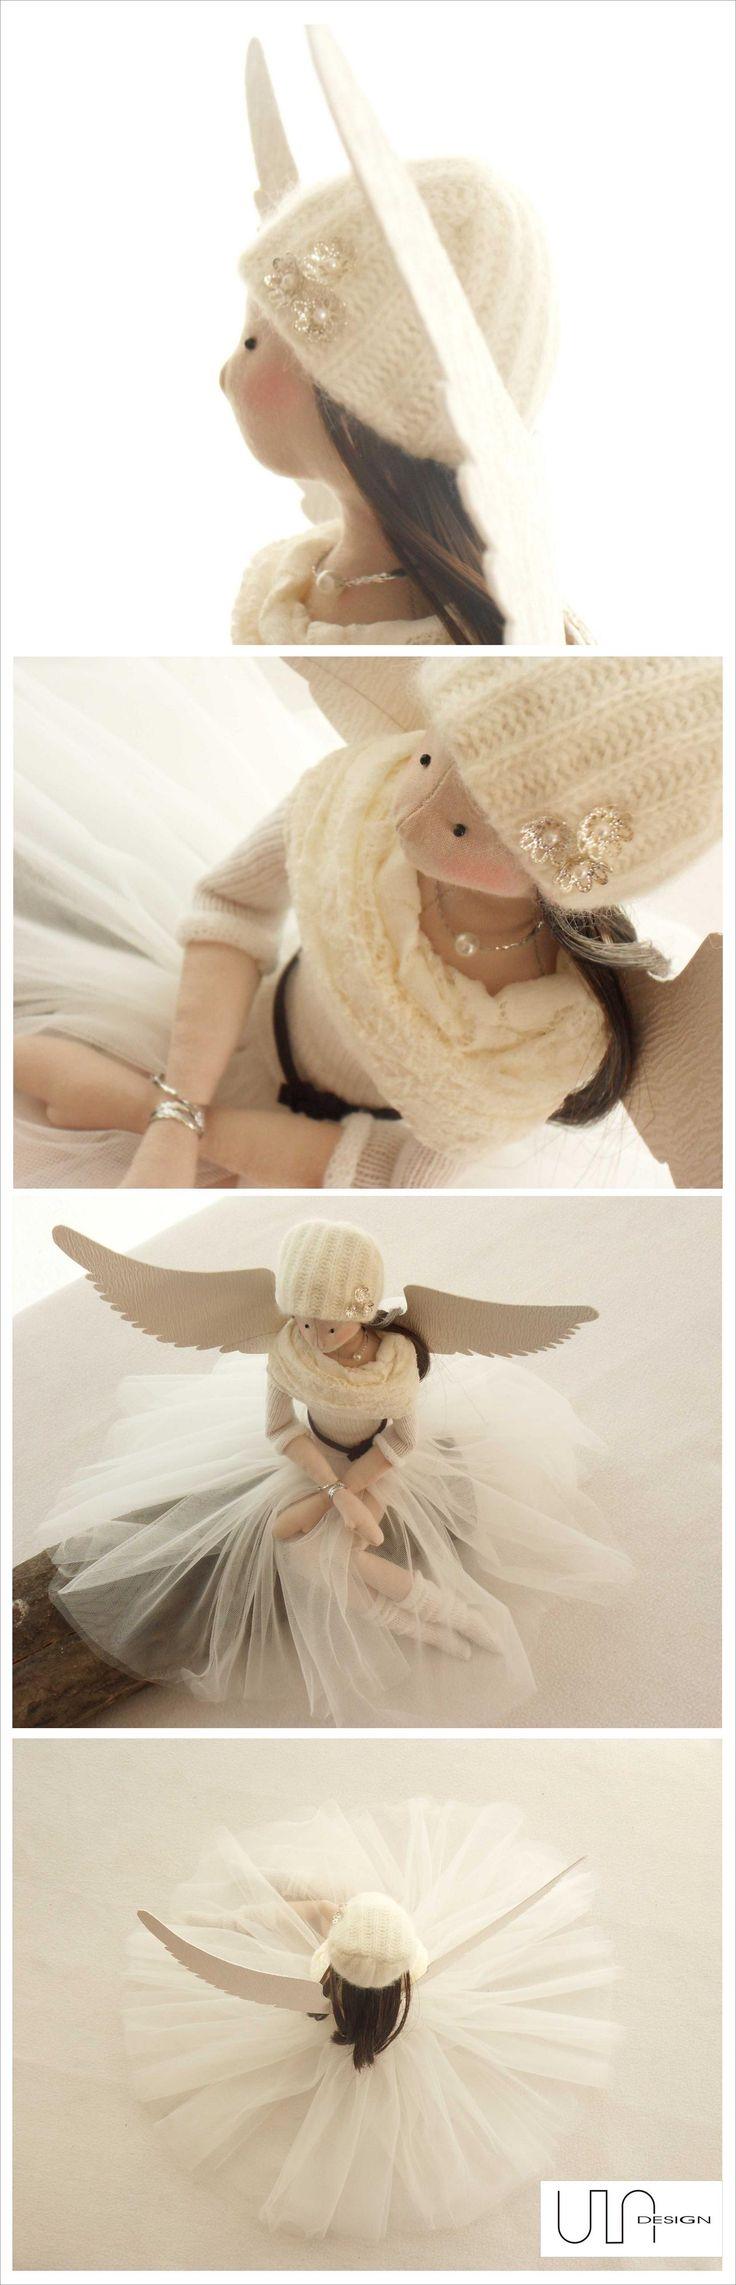 315 best handmade dolls 2 images on Pinterest | Stofftiere, Puppe ...